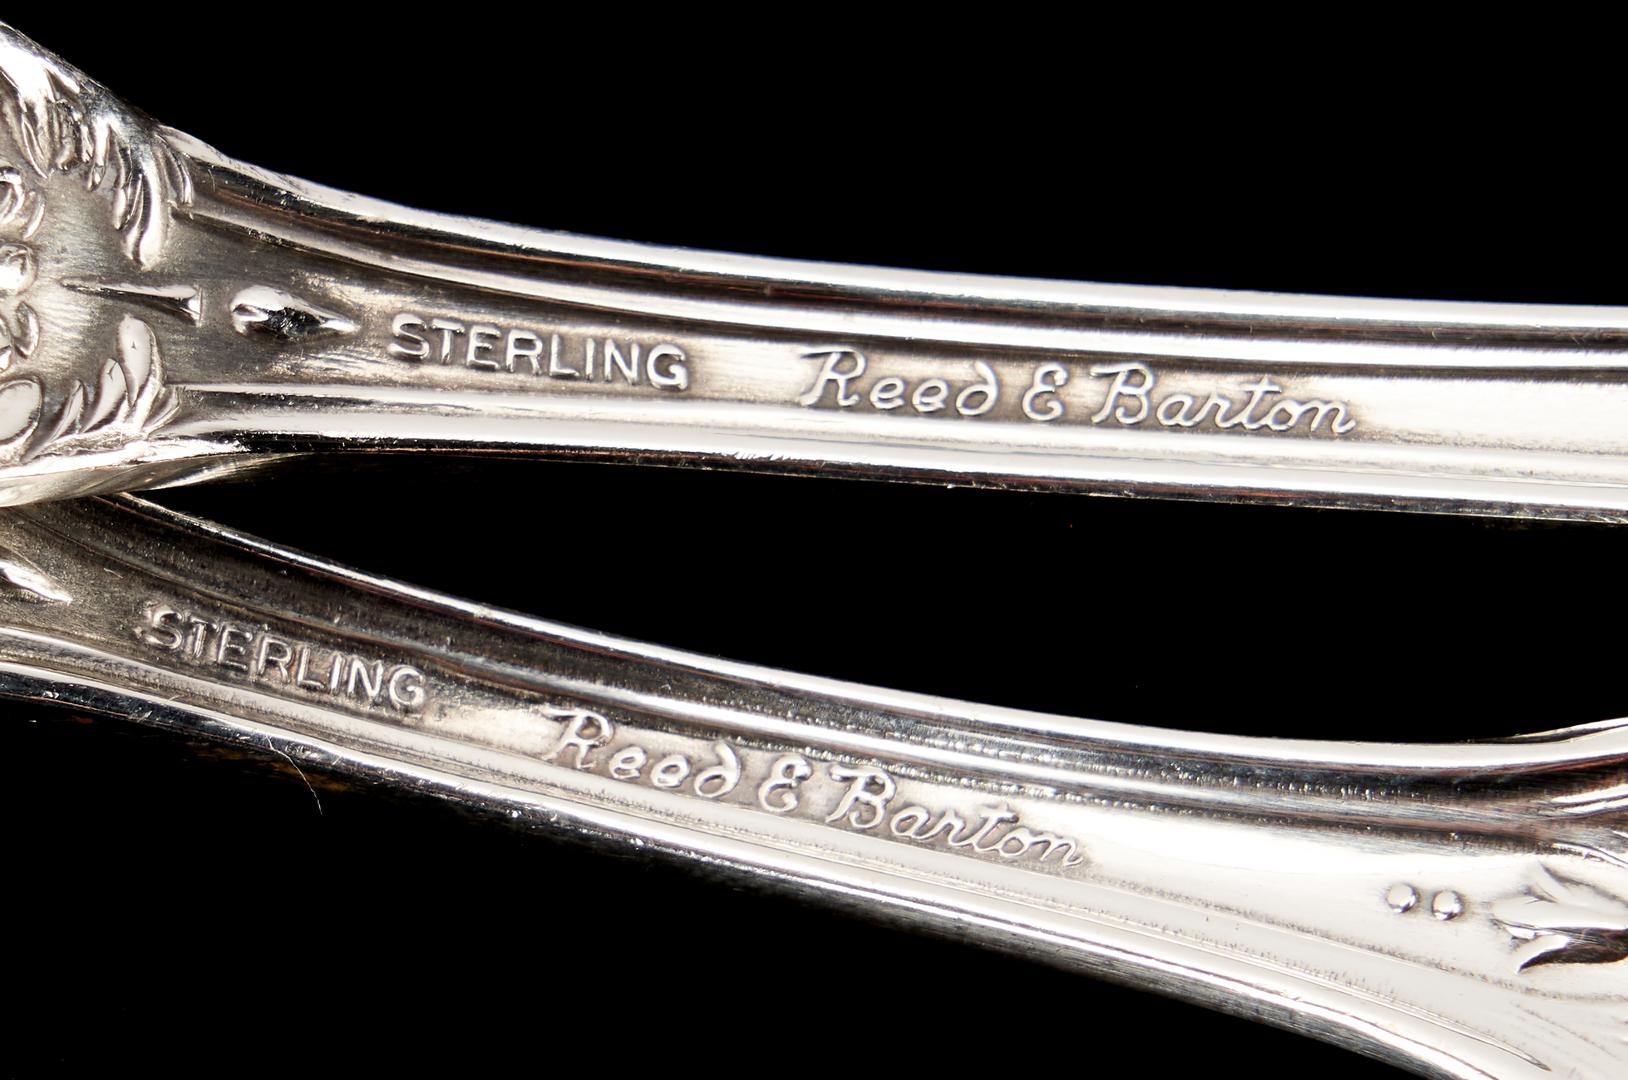 Lot 90: 116 Pcs. Reed & Barton Francis I Sterling Silver Flatware